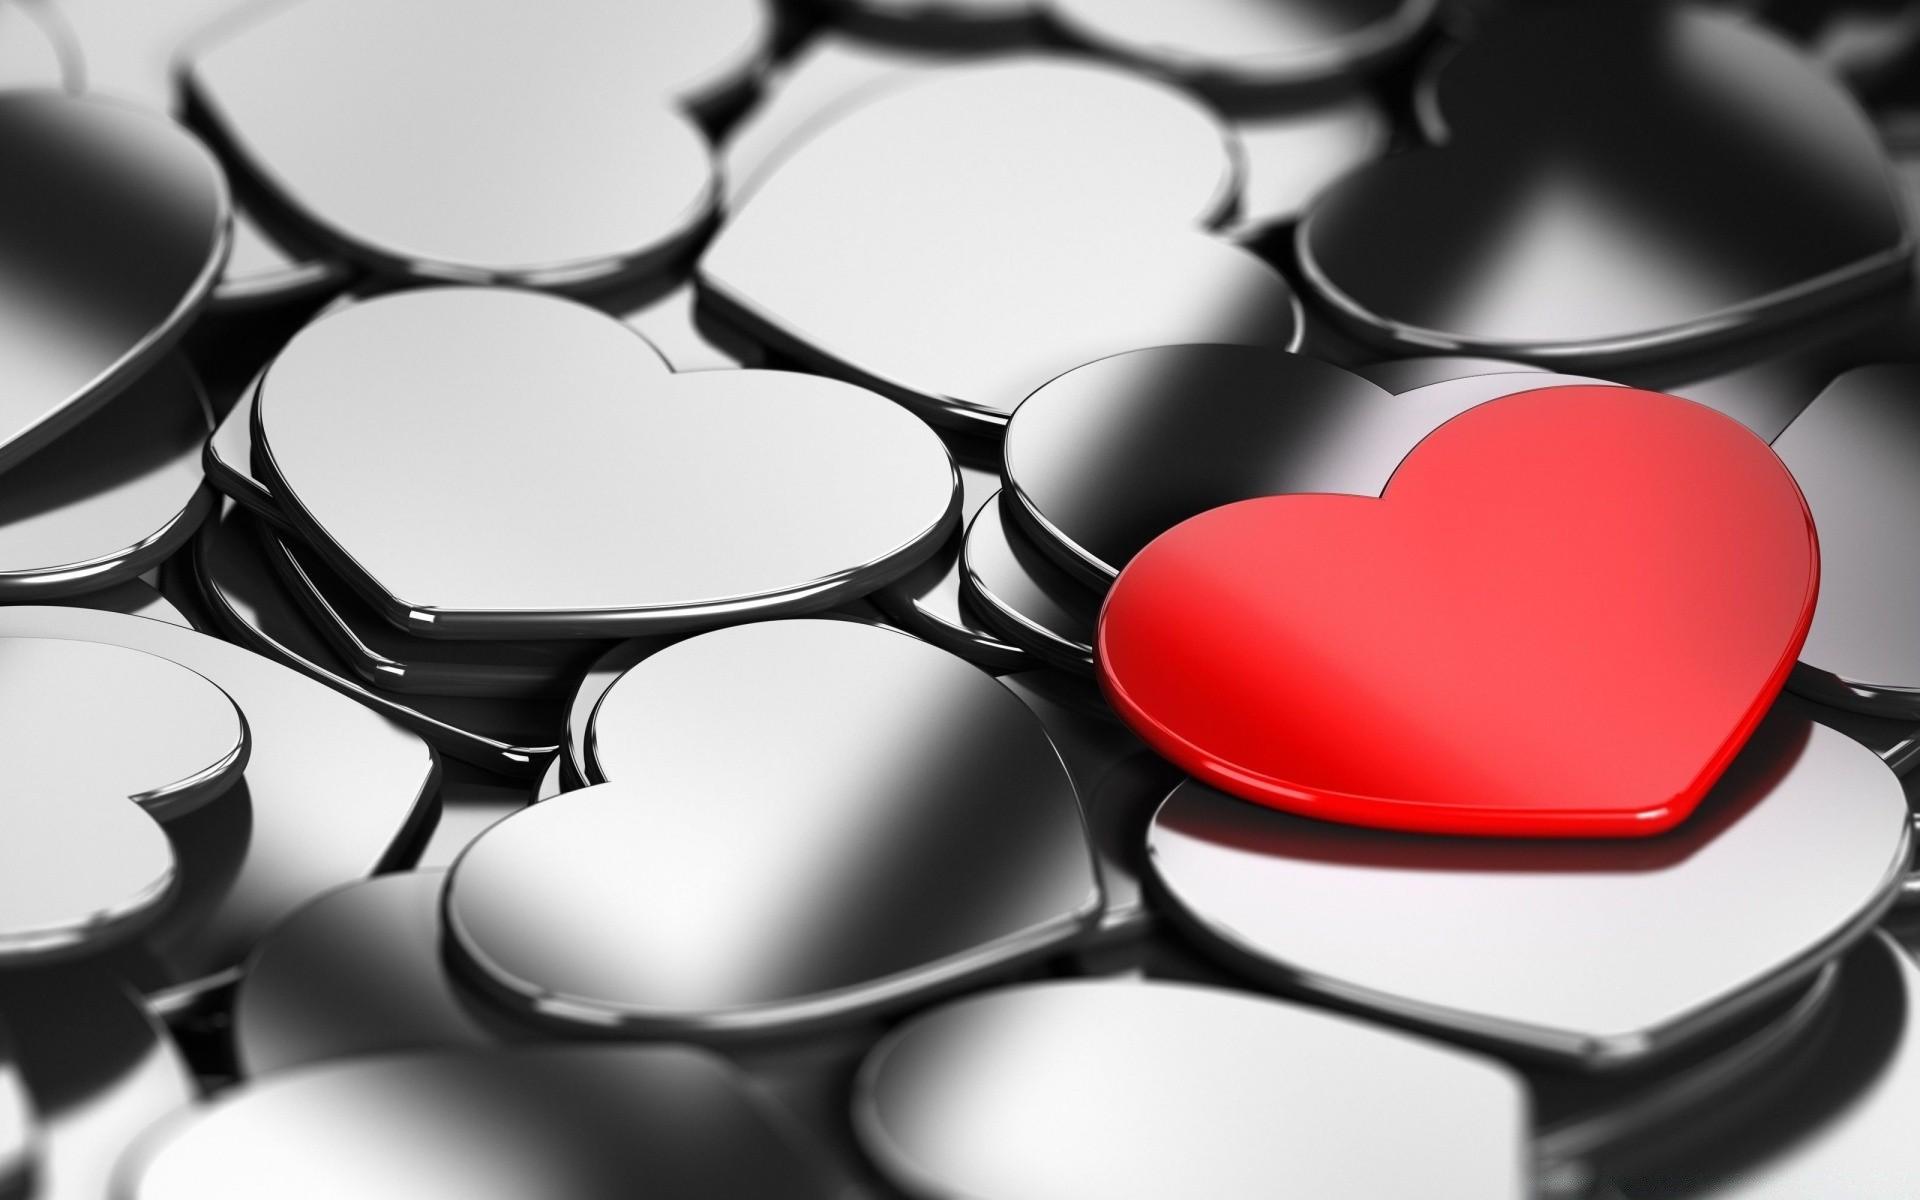 начался картинка на рабочий стол сердце занято собой